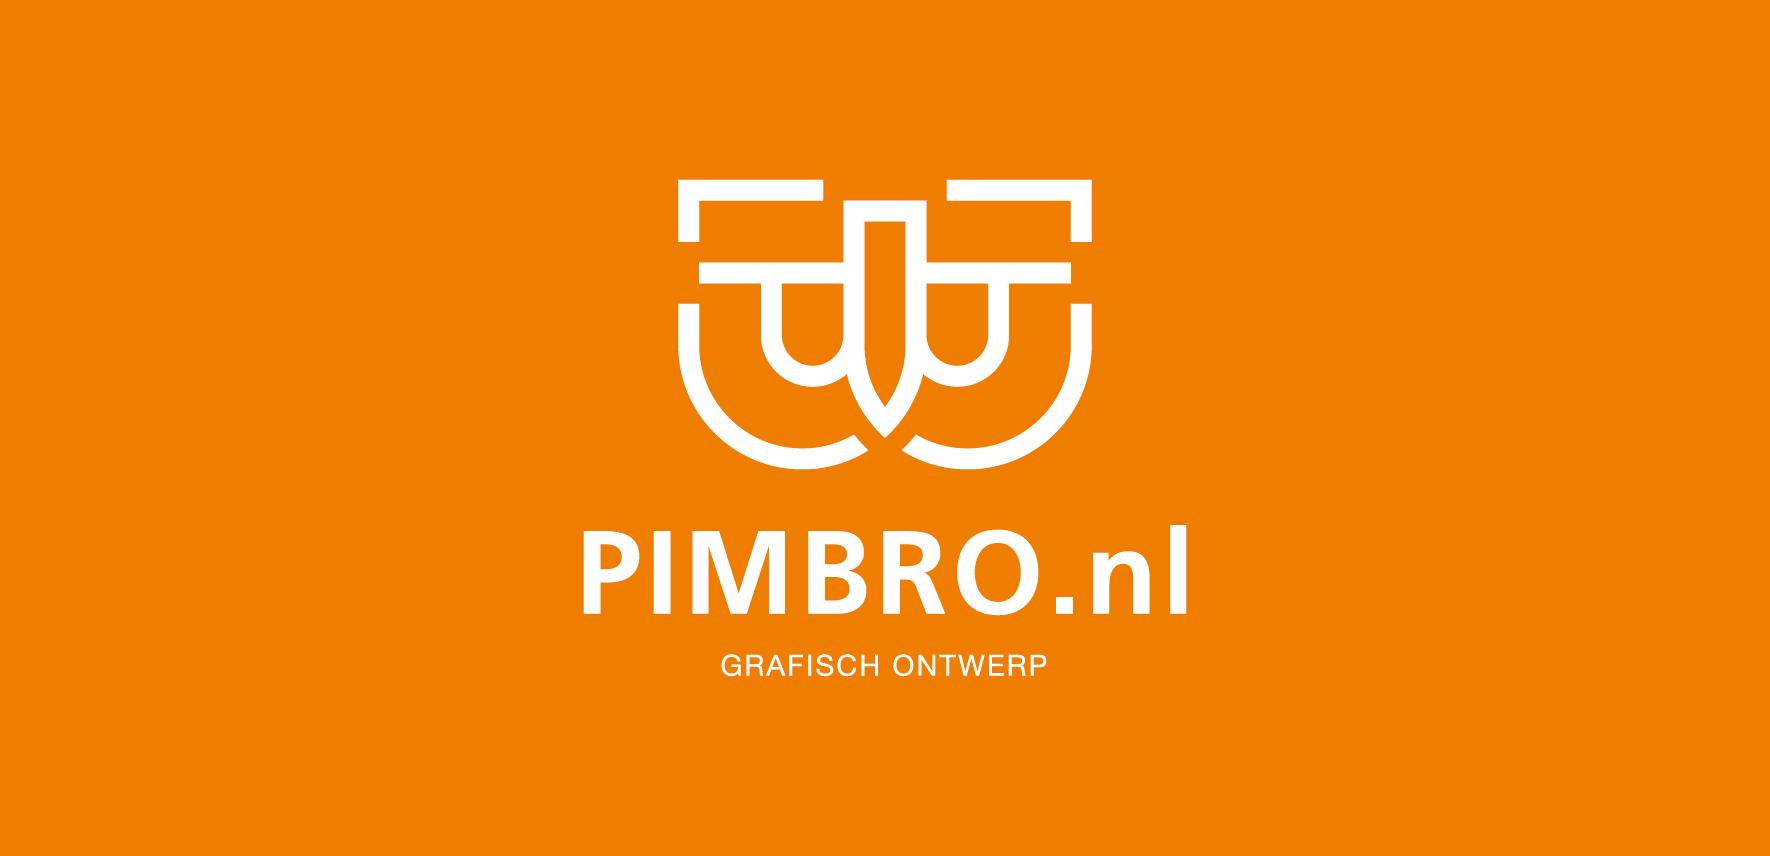 Pimbro